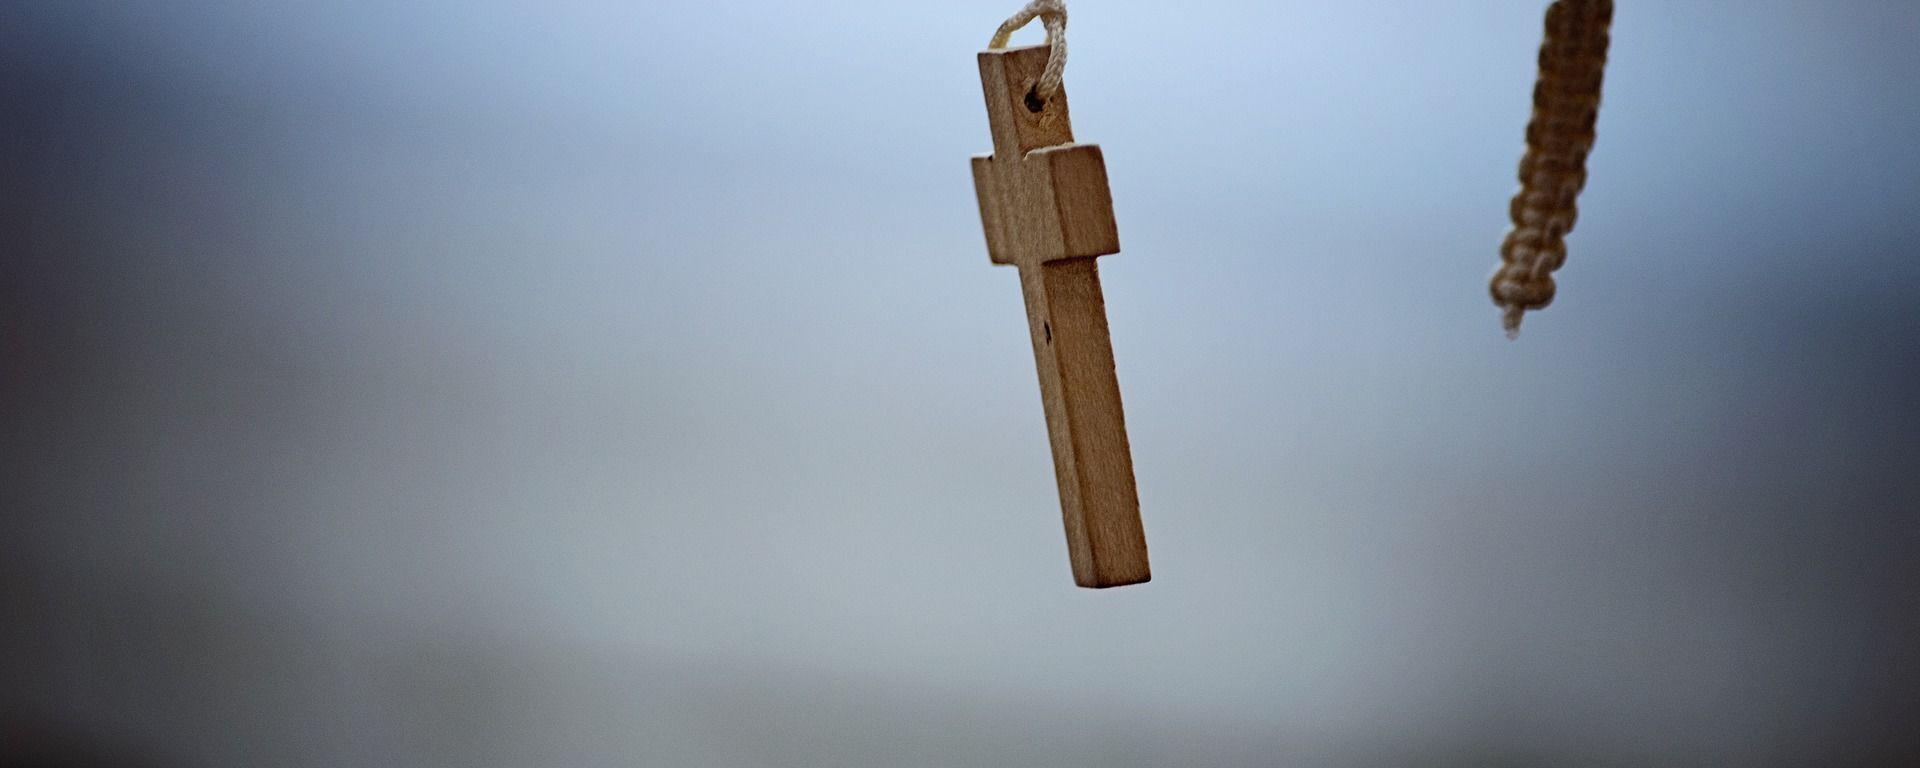 Una cruz católica  - Sputnik Mundo, 1920, 23.06.2021